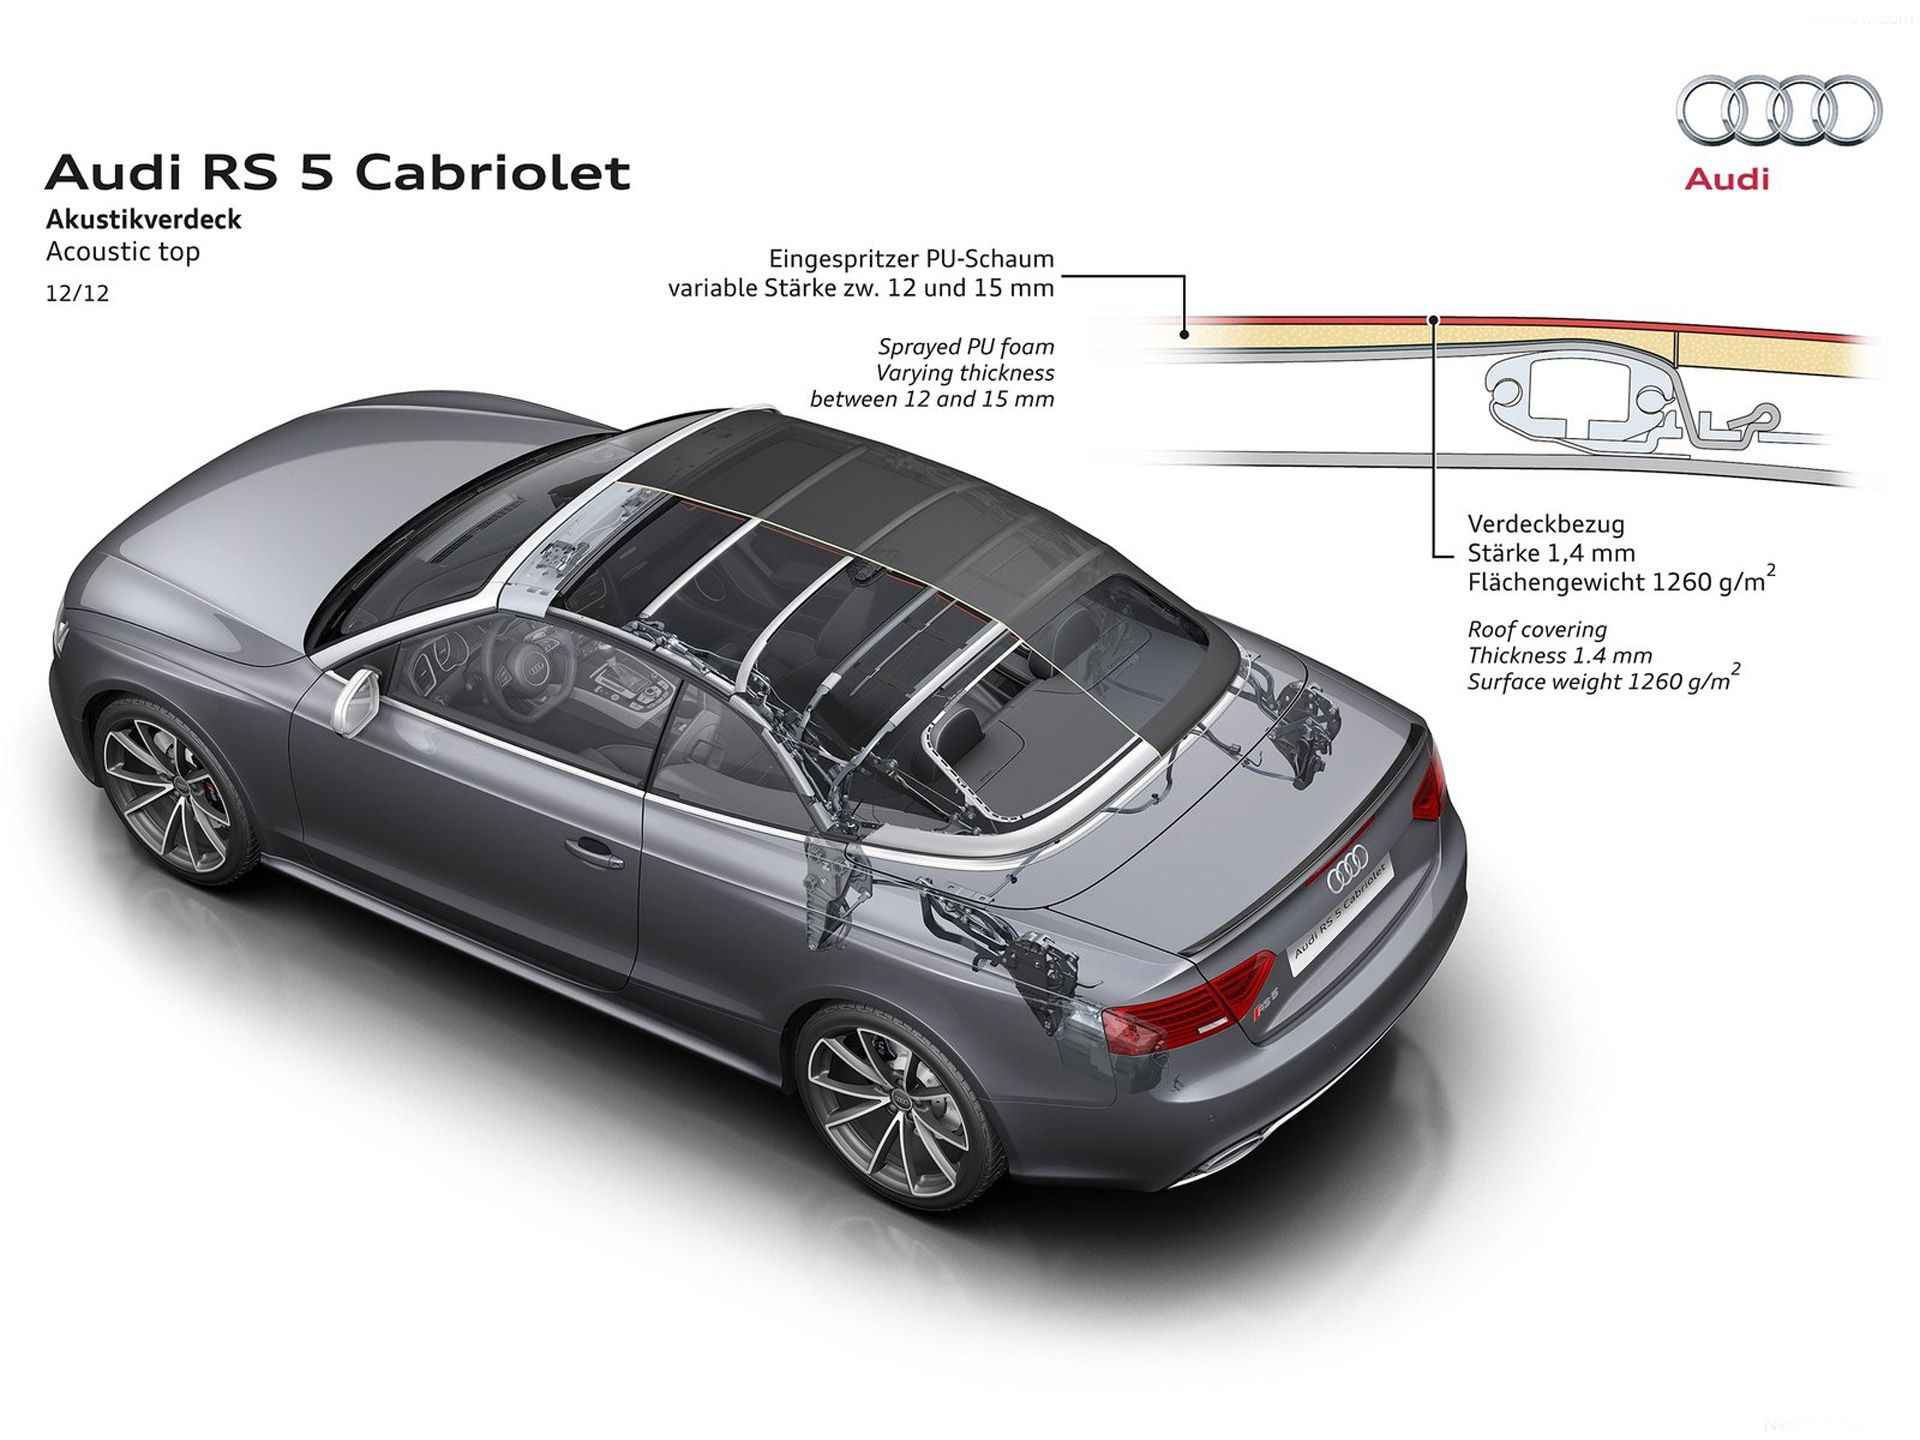 2014 Audi RS5 Cabriolet Design 2014 Audi RS5 Cabriolet Specs and ...